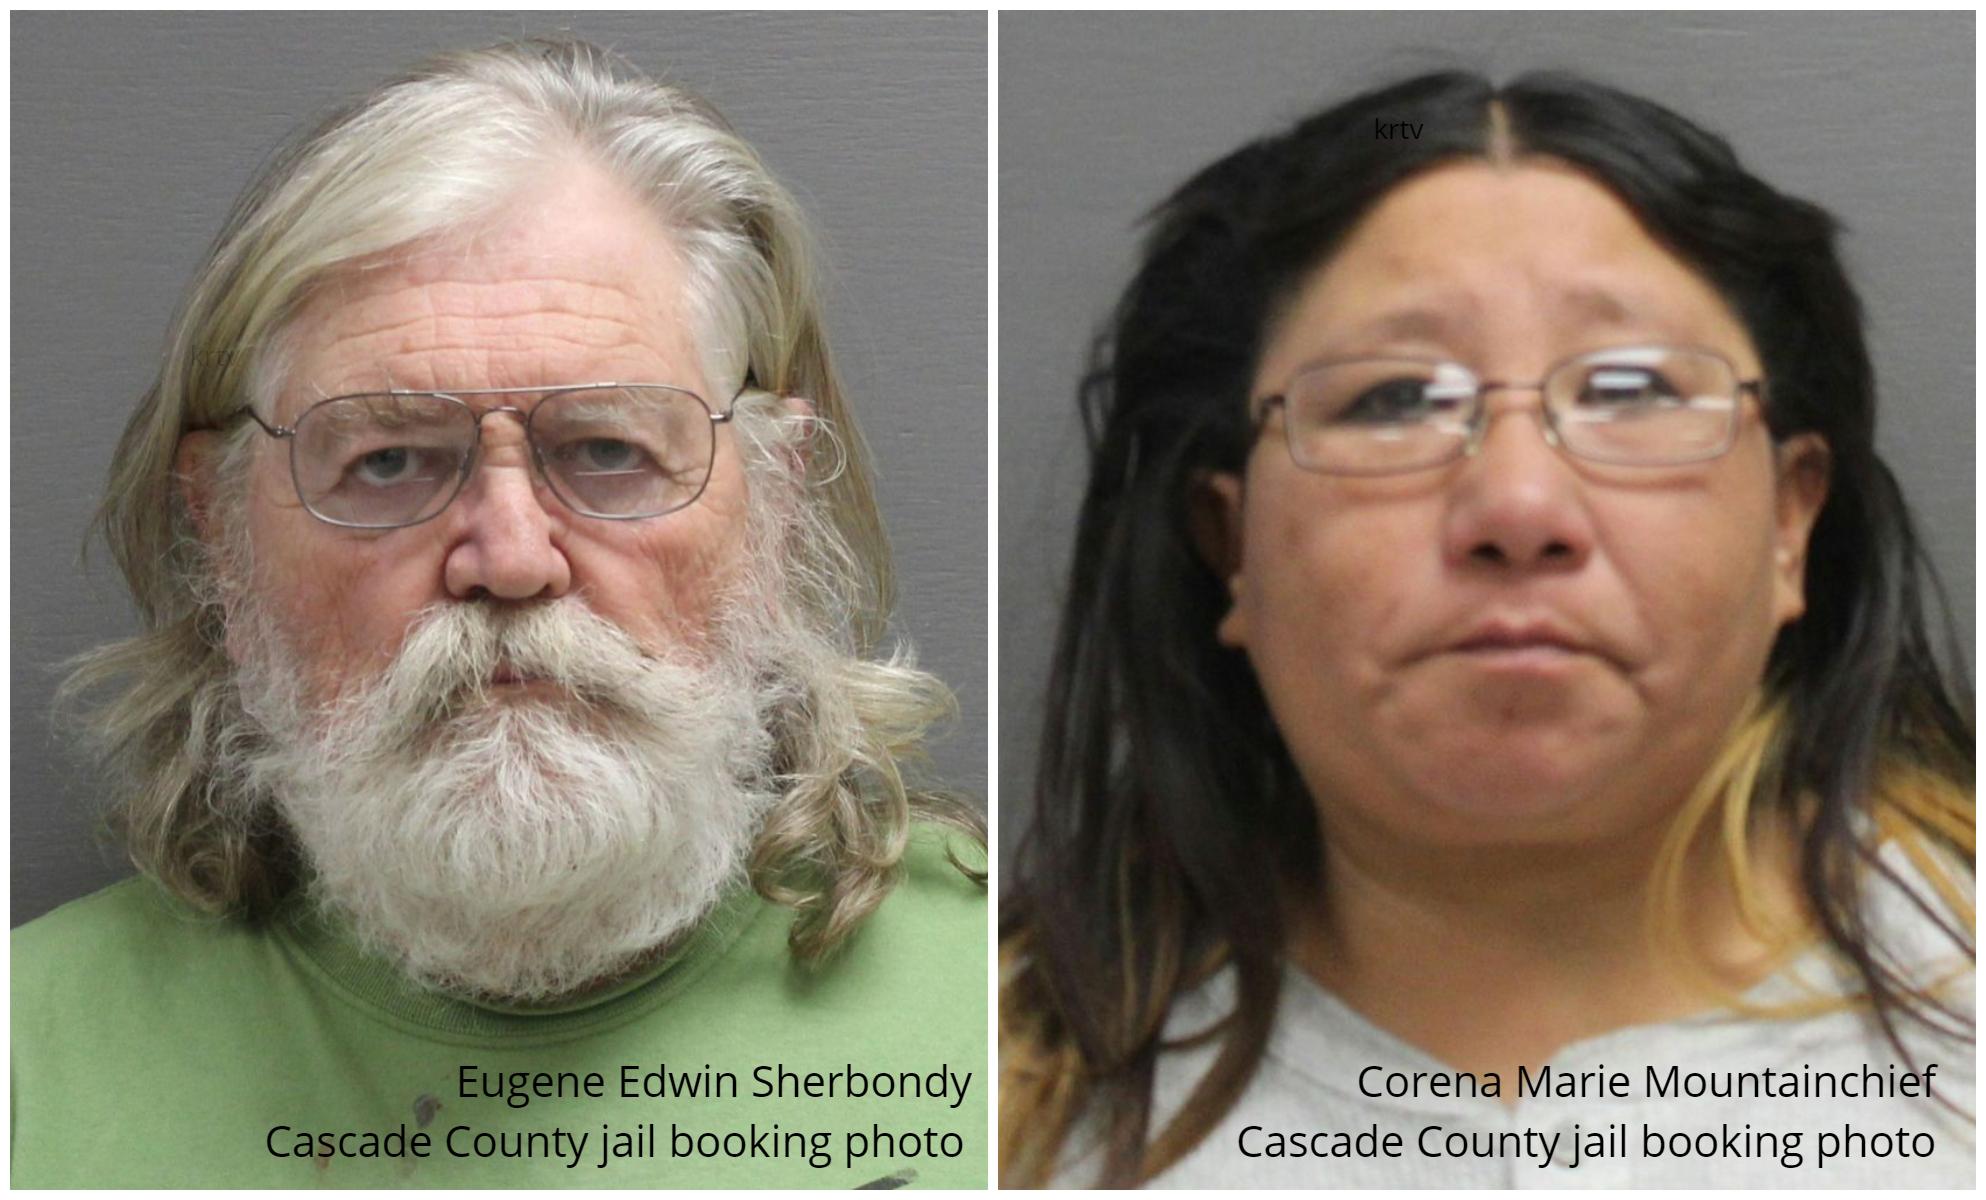 Eugene Edwin Sherbondy and Corena Marie Mountainchief